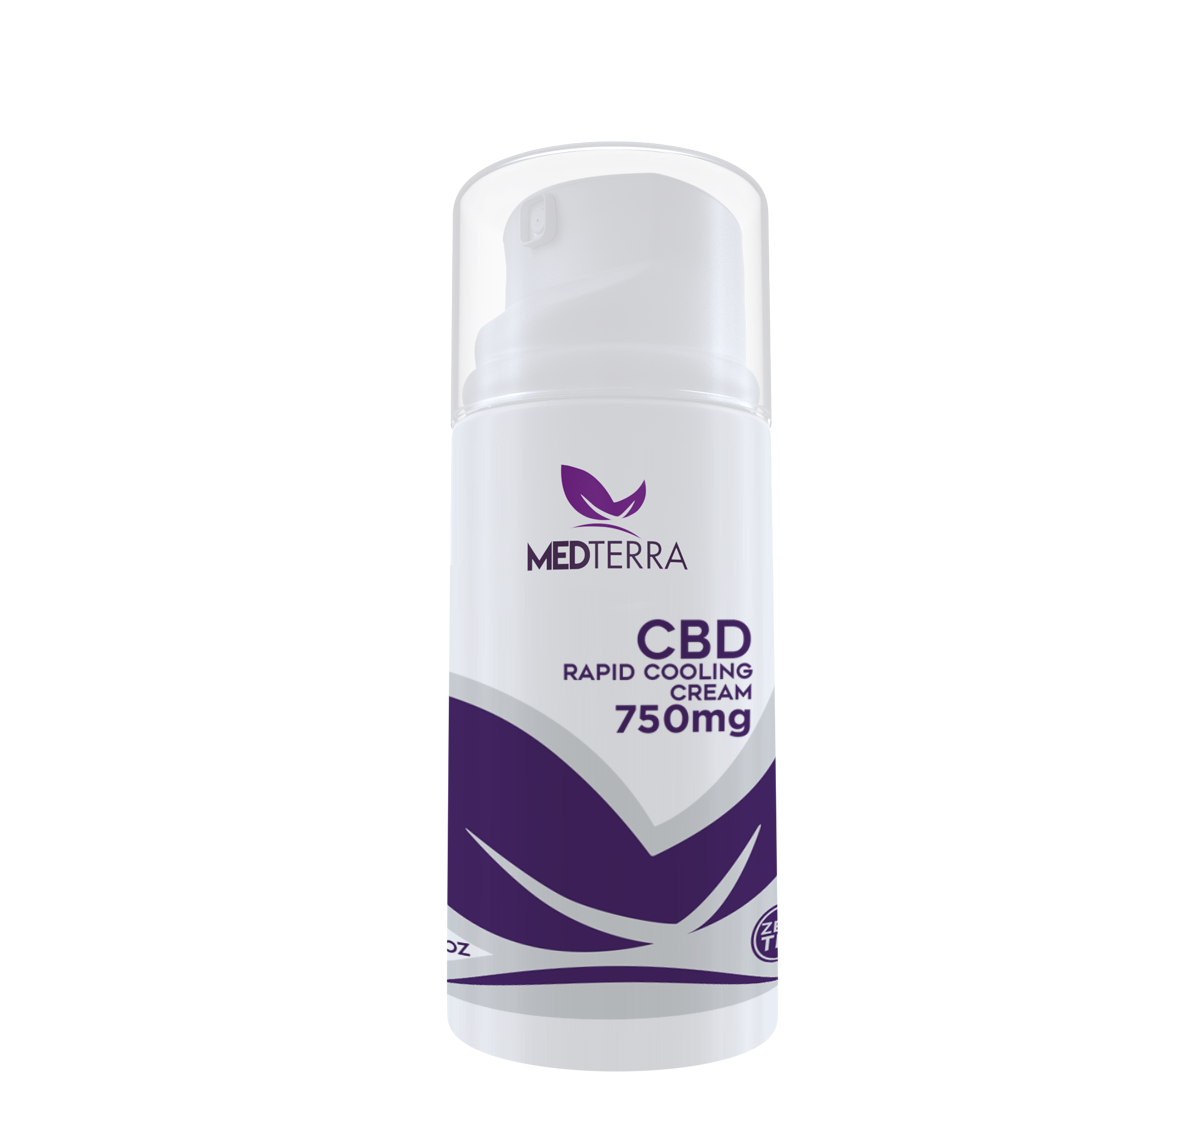 Medterra 750mg CBD Rapid Cooling Topical Cream 3.4fl.oz